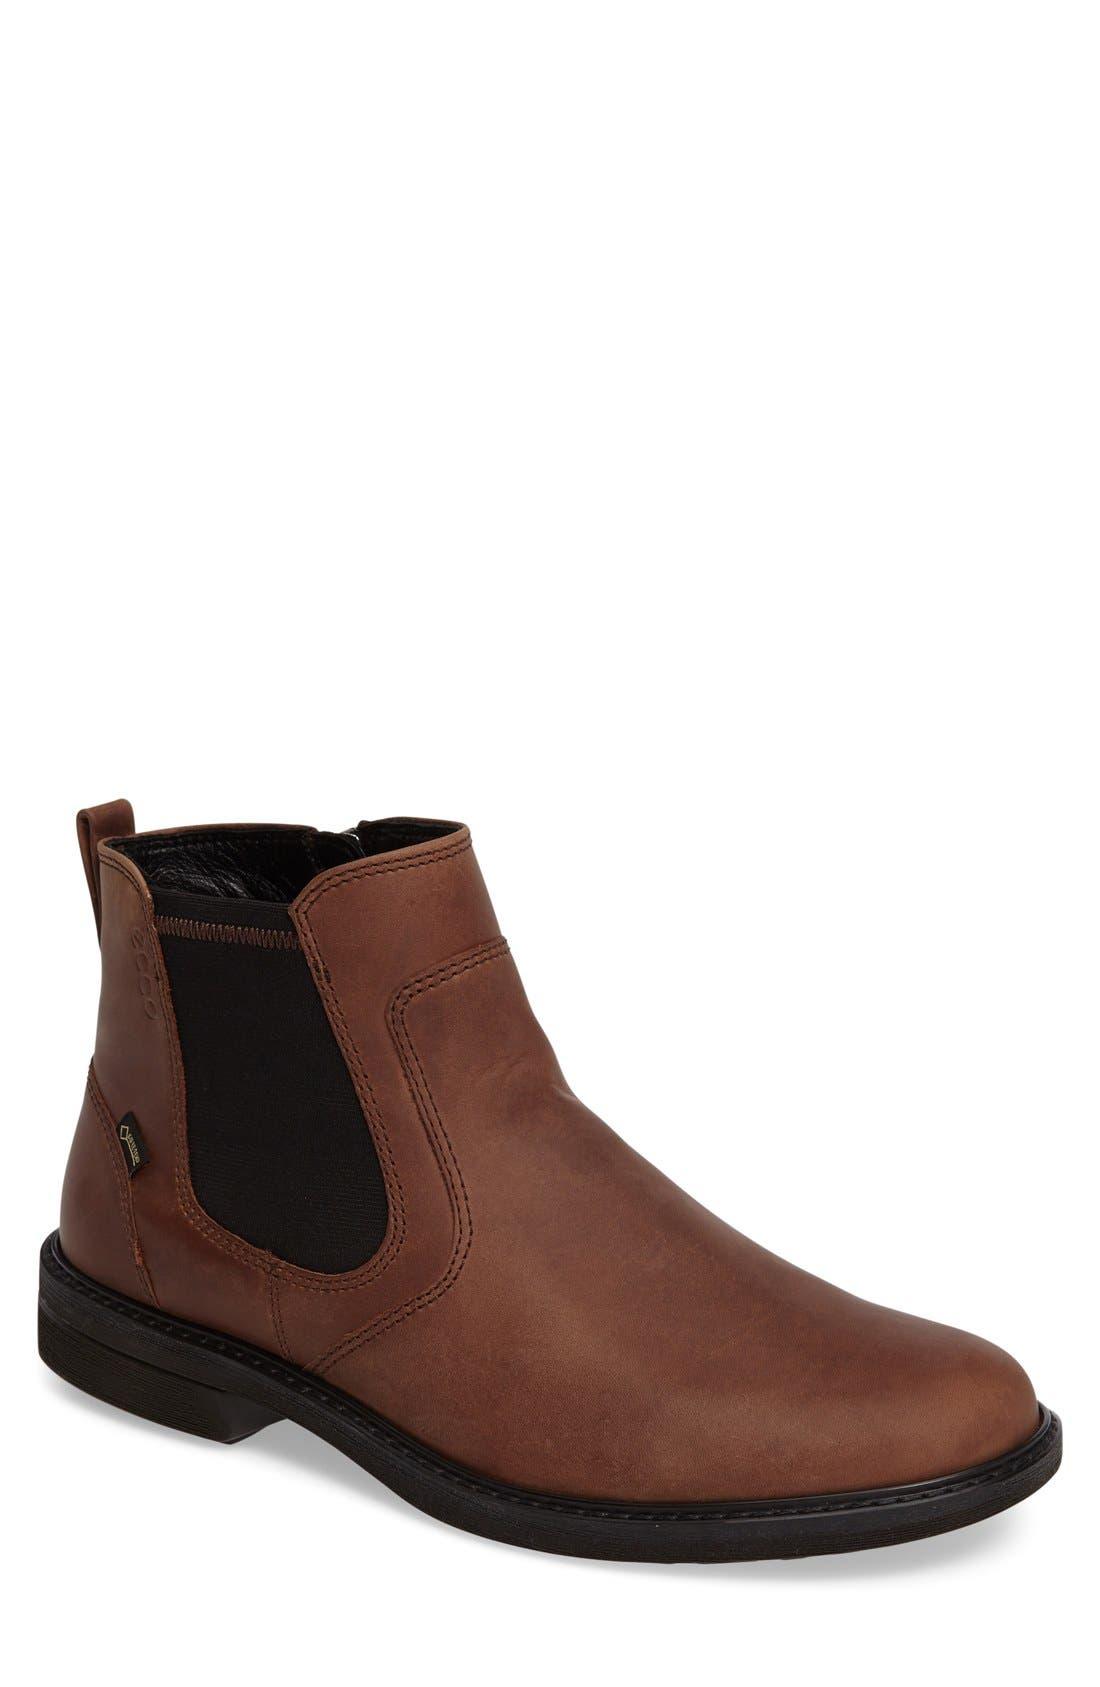 Turn GTX Chelsea Boot,                         Main,                         color,